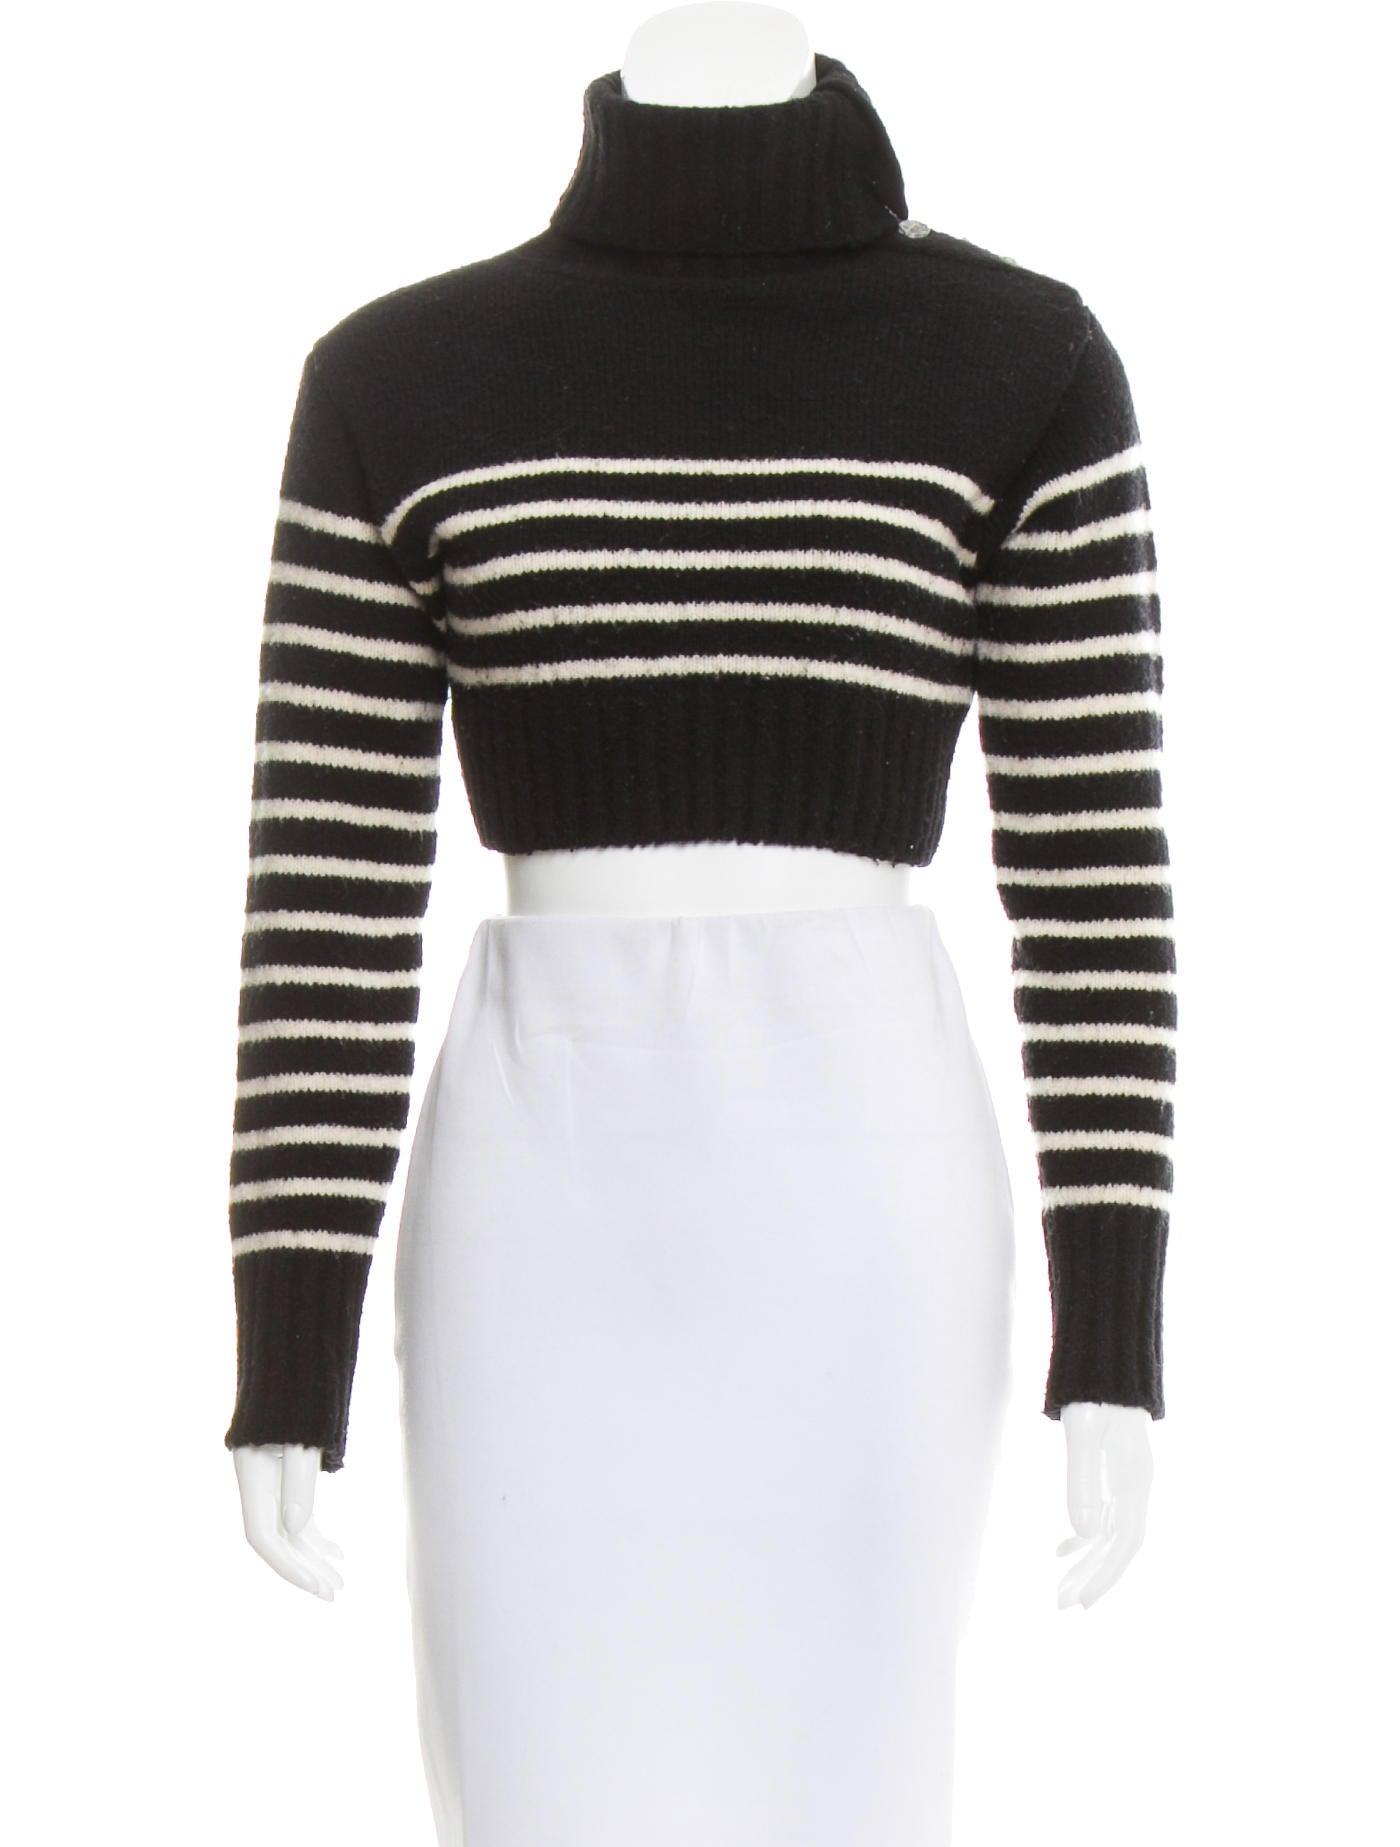 Jean Paul Gaultier Cropped Turtleneck Sweater Clothing Jea28366